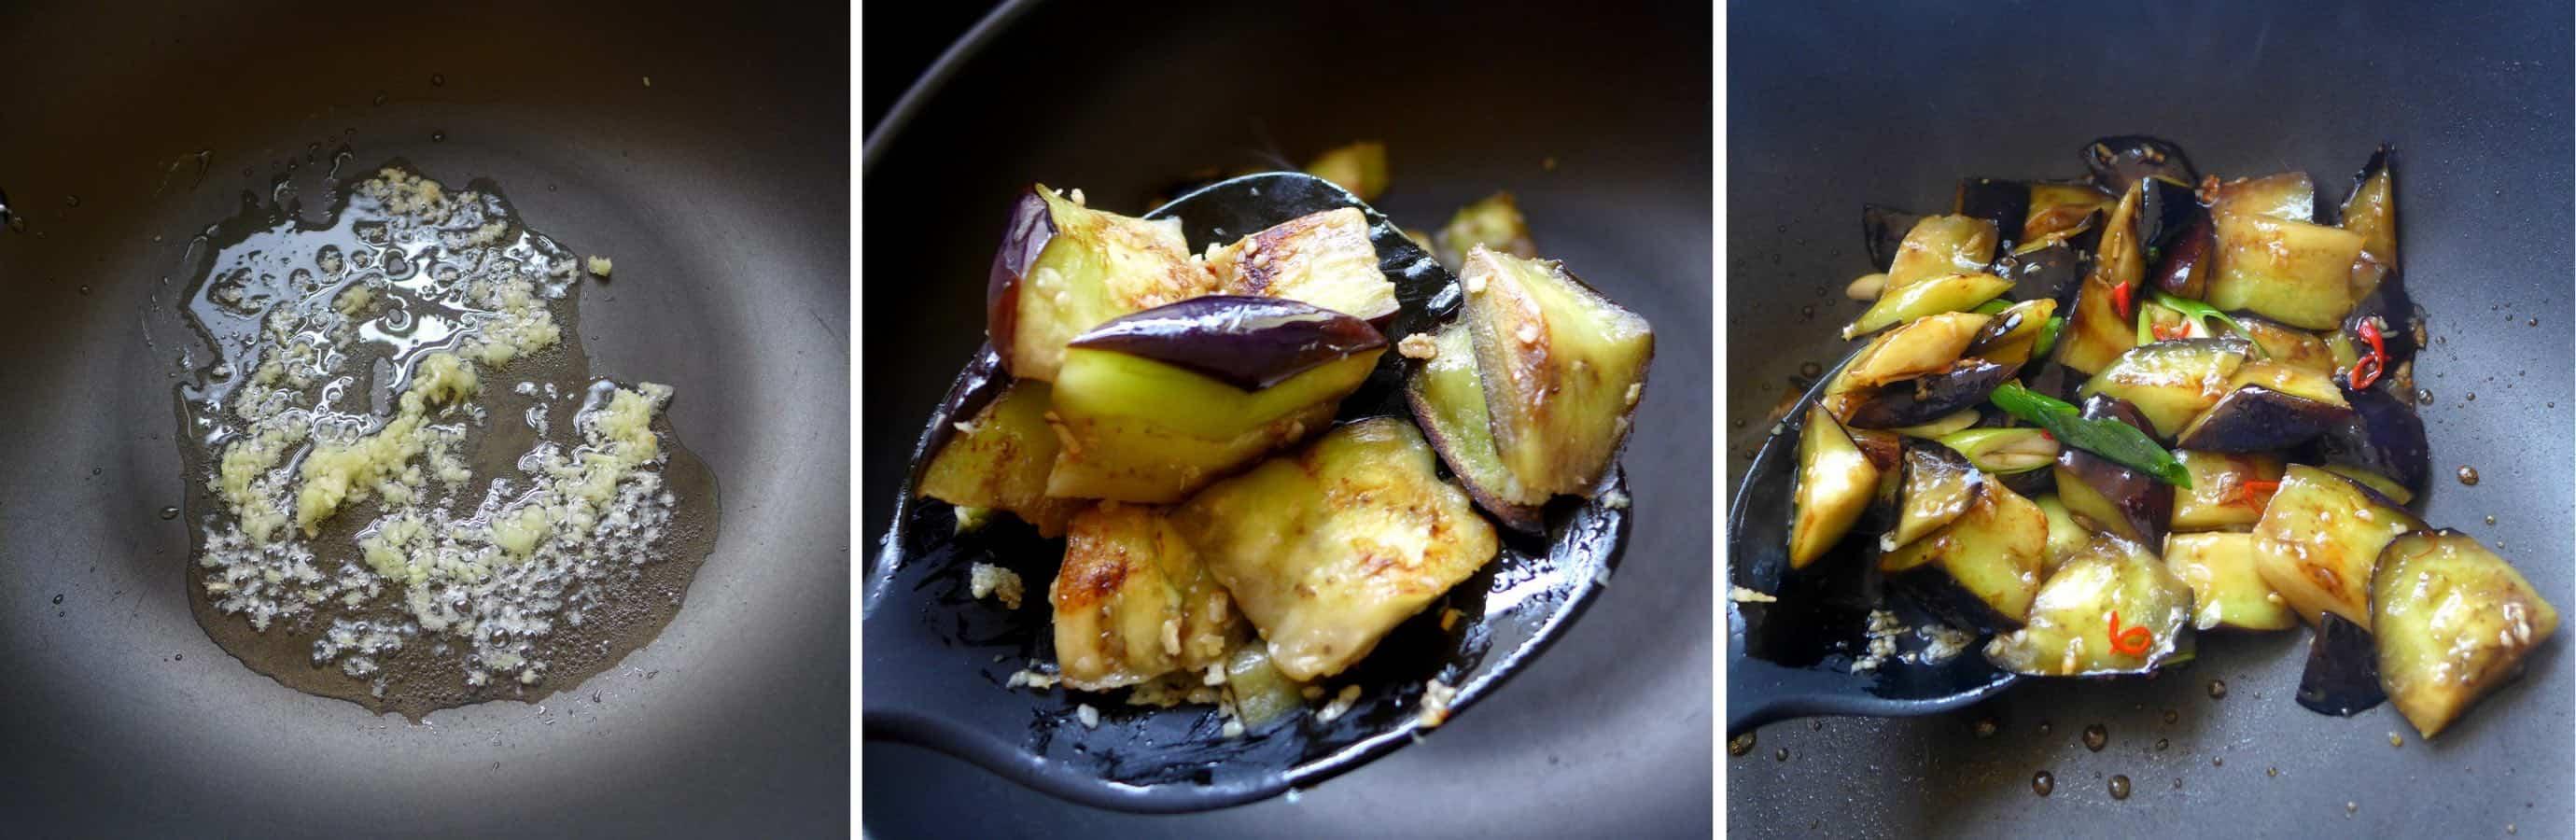 stir-frying eggplant with plum sauce